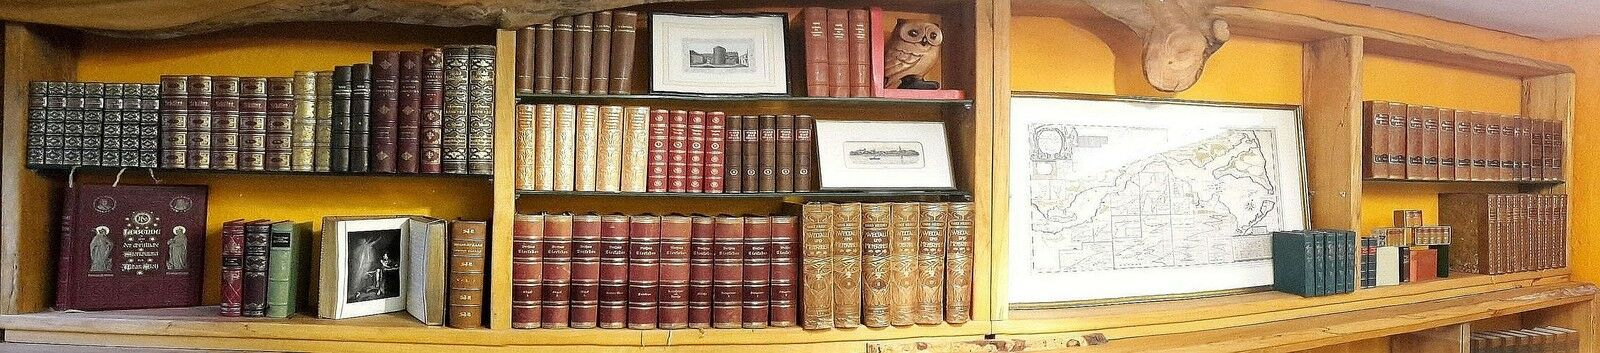 Antiquariat Bücherwurm